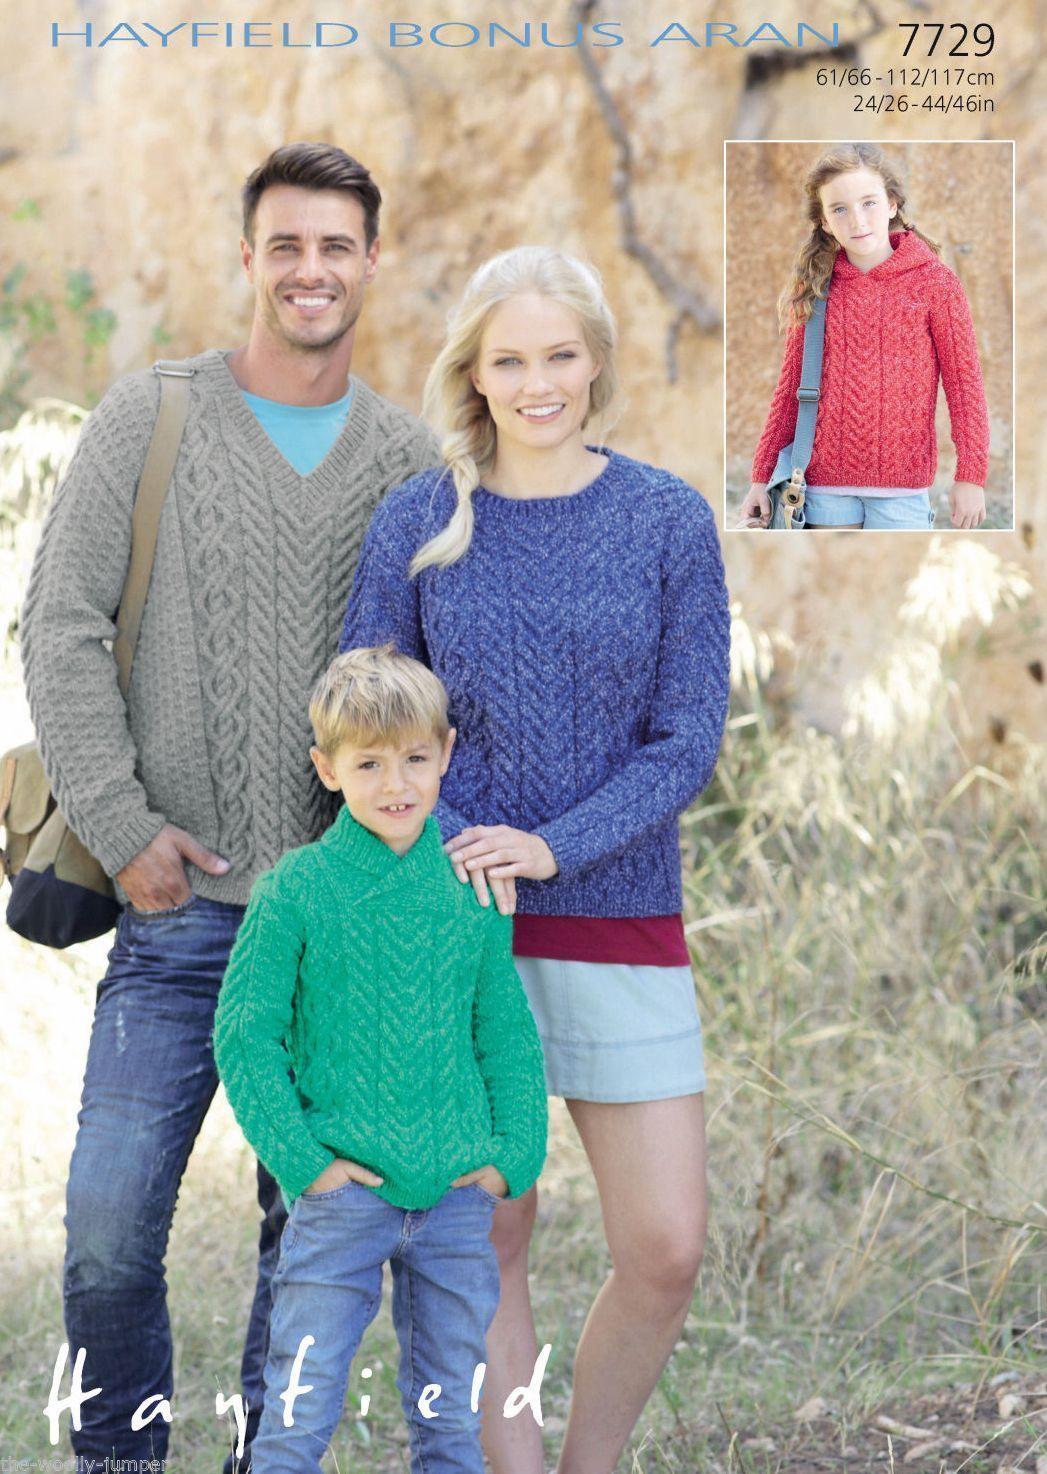 7729 Hayfield Bonus Aran Sweater Knitting Pattern To Fit Chest